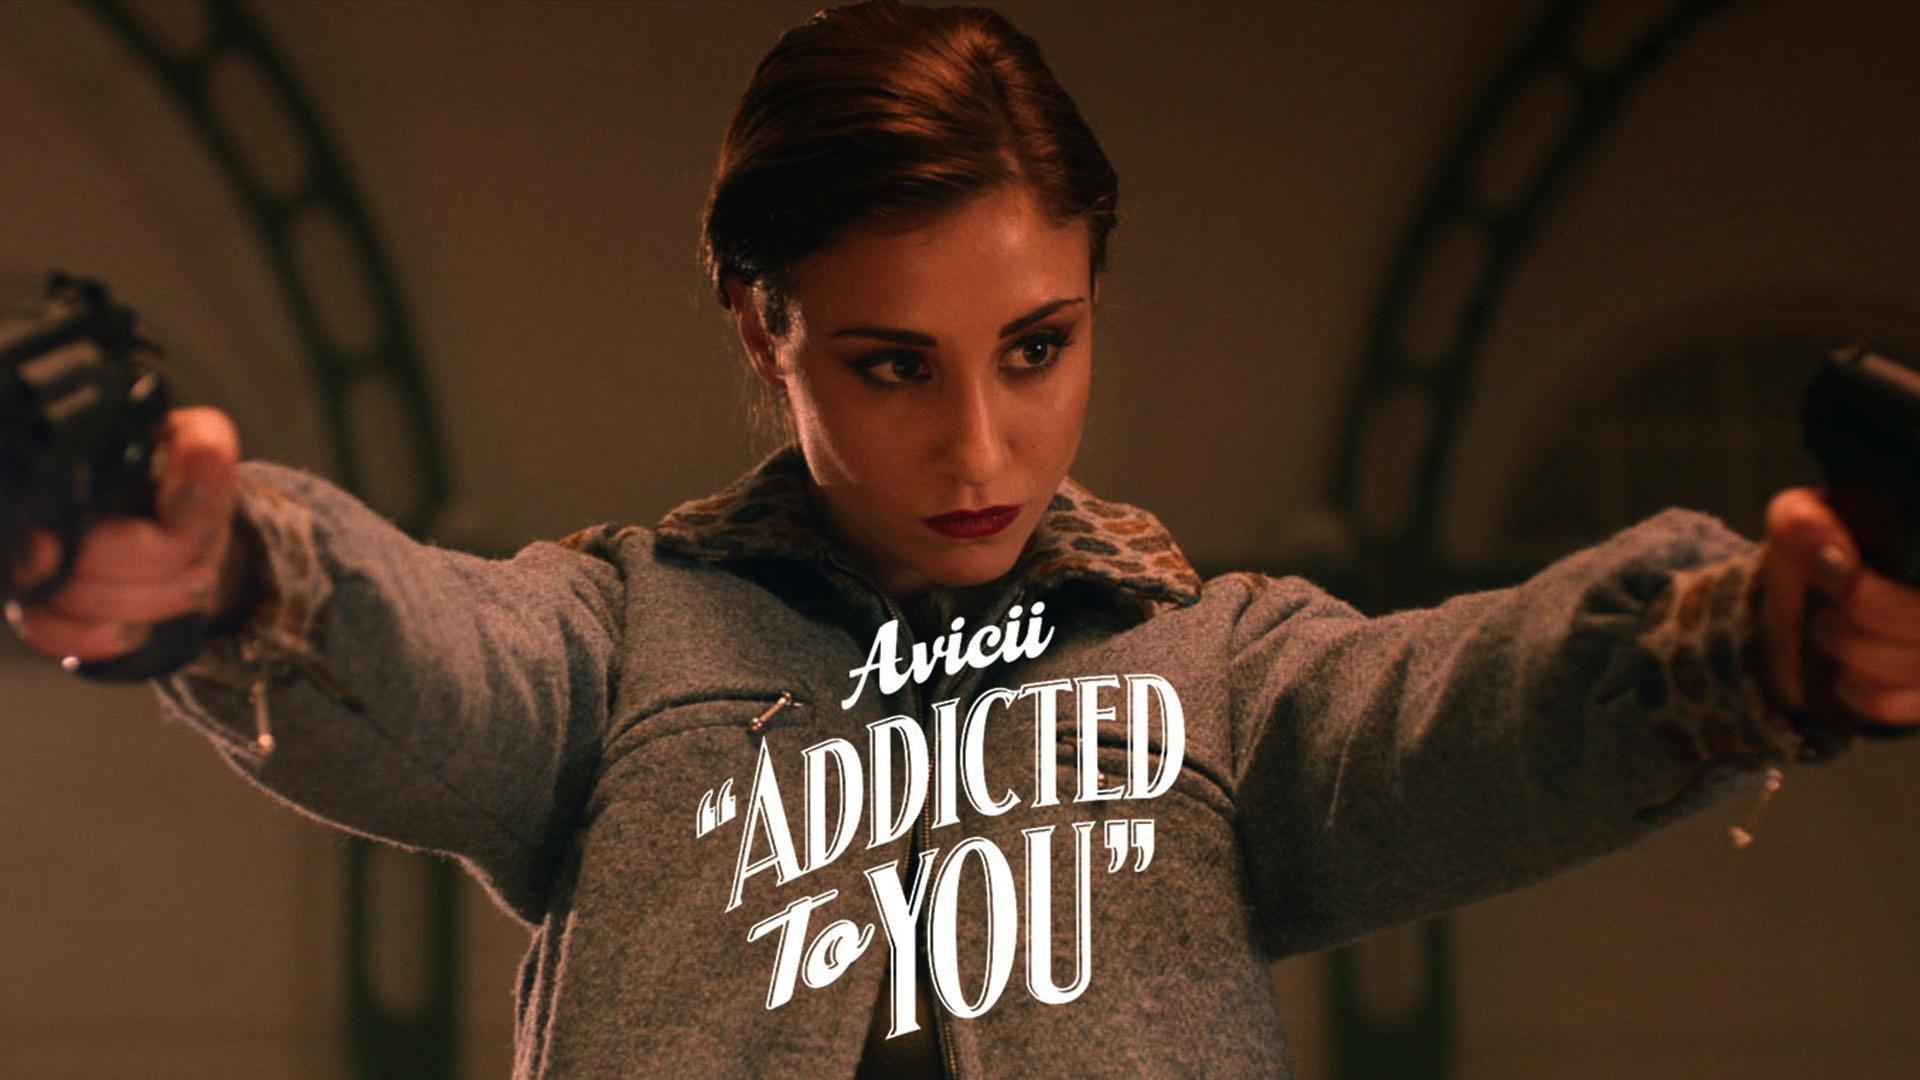 Avicci Addicted to you lesbians